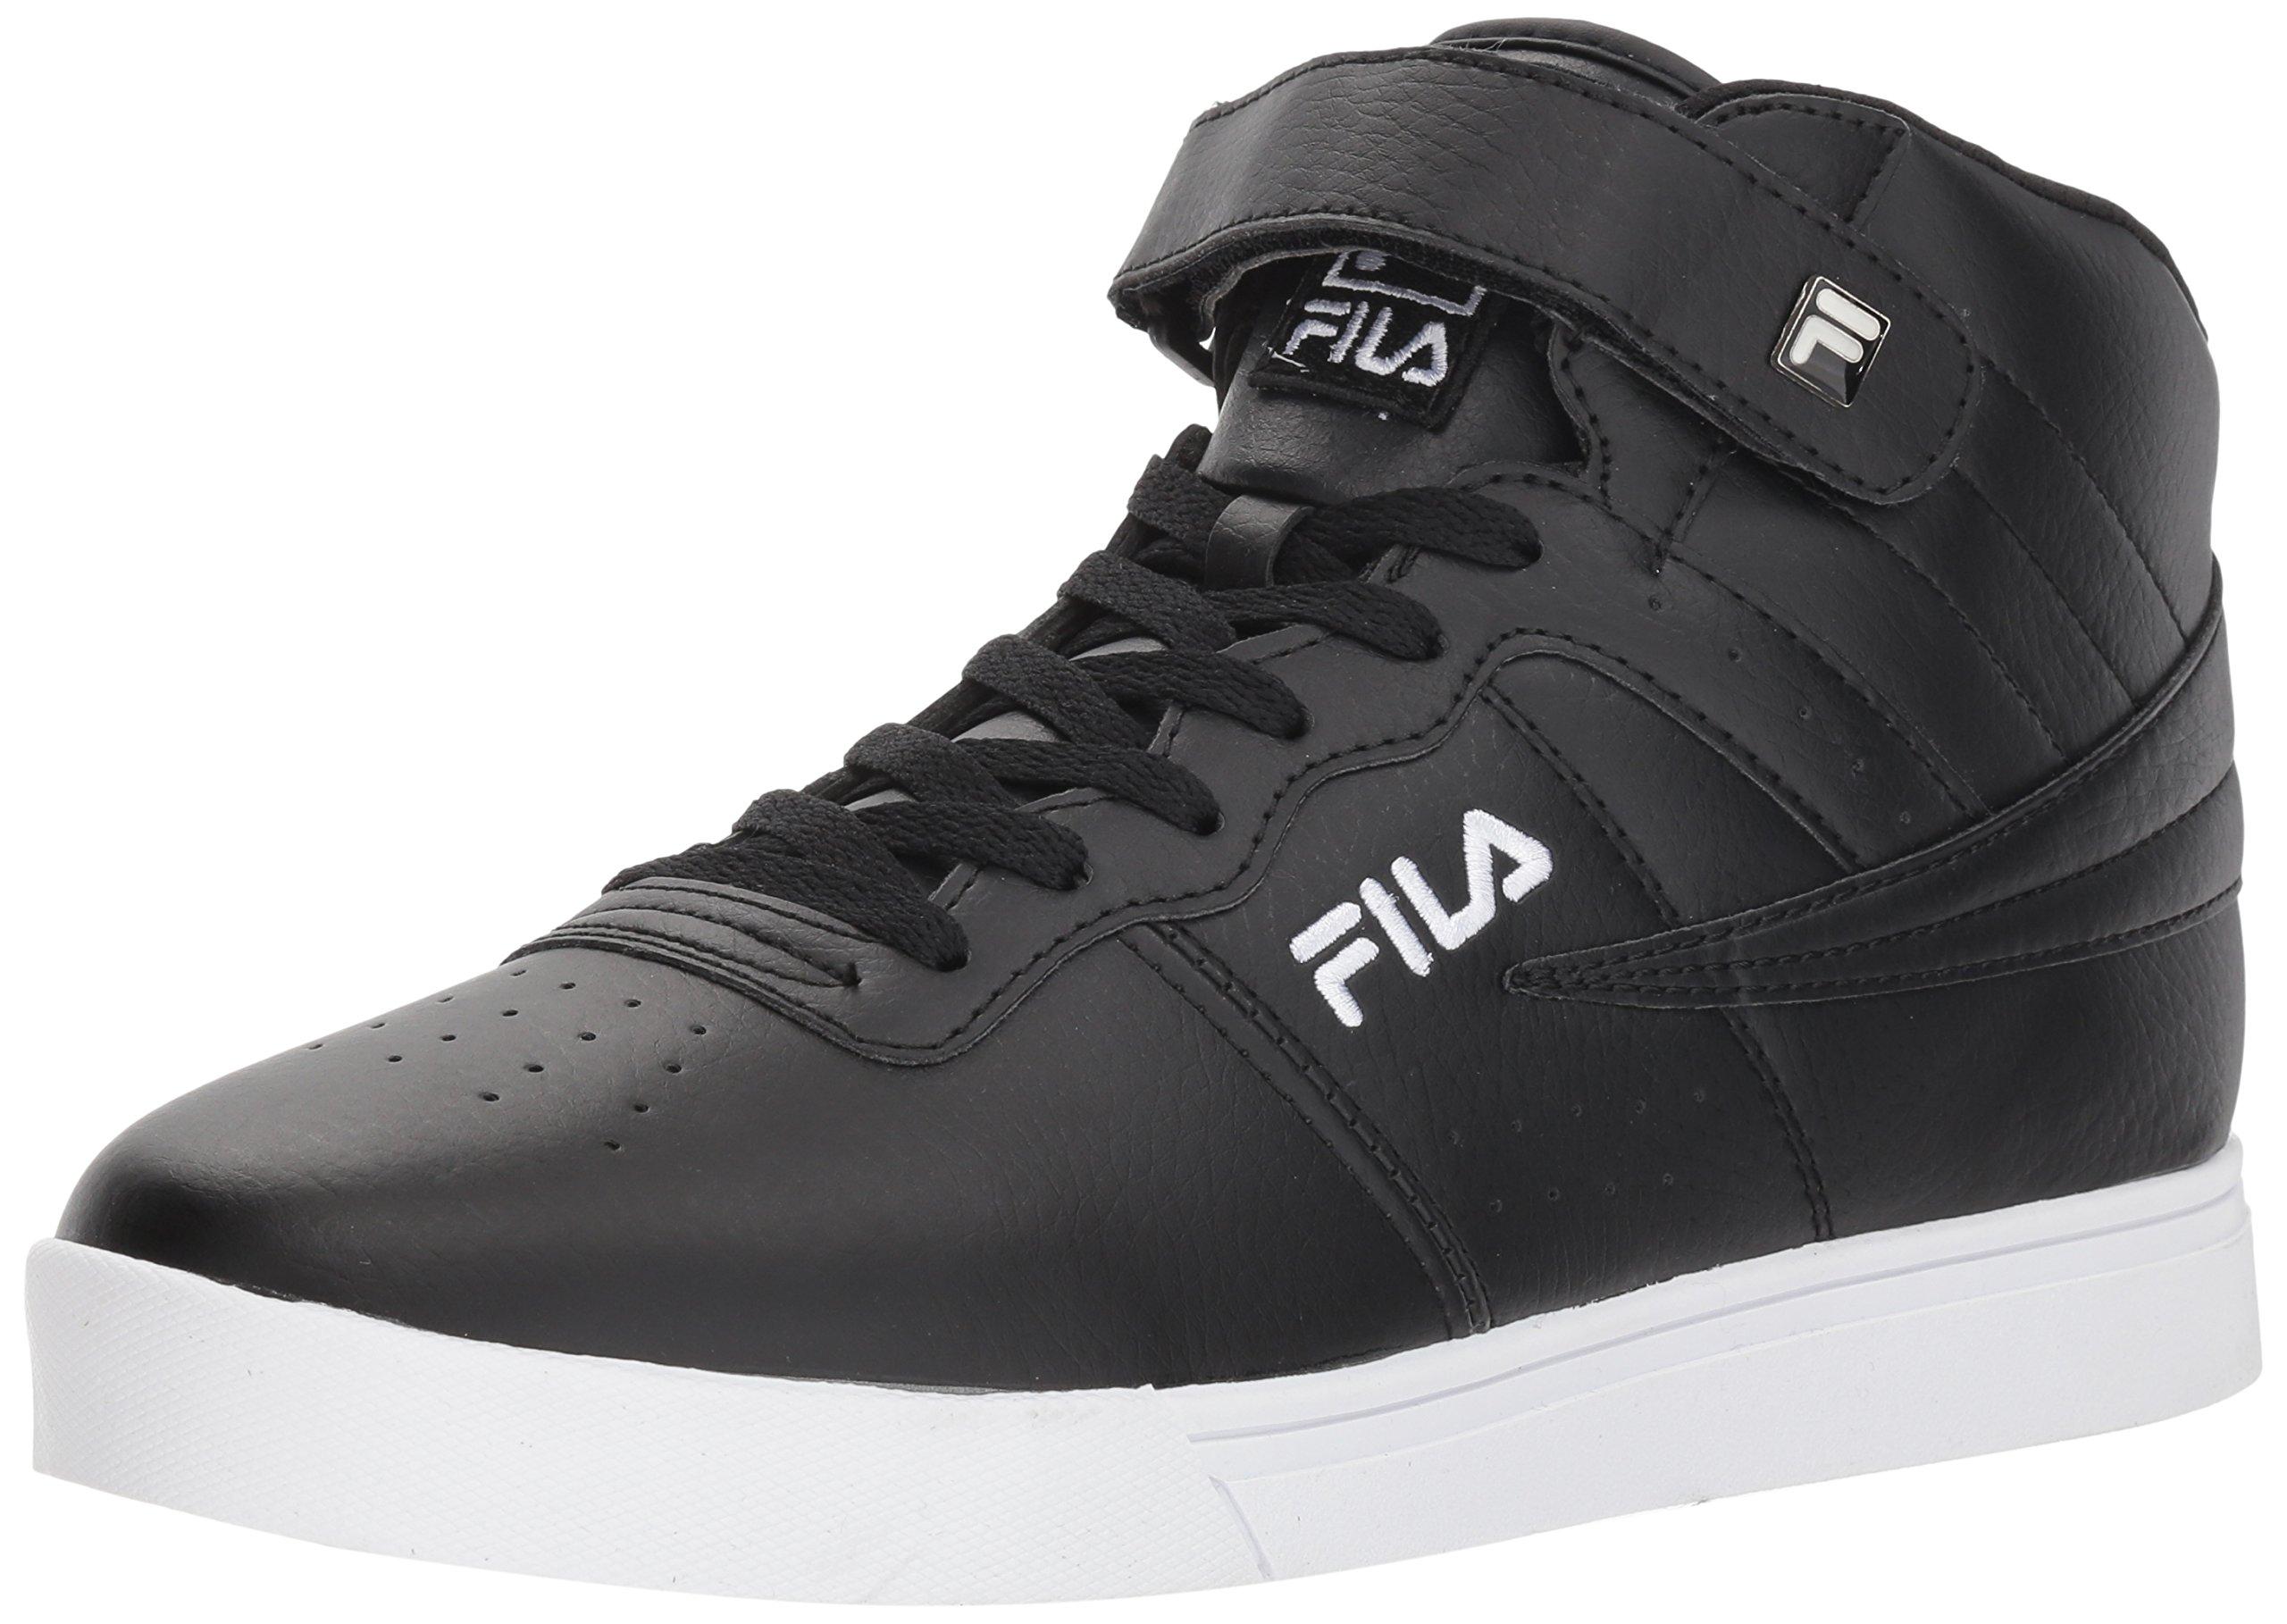 Vulc 13 Mid Plus Walking Shoe